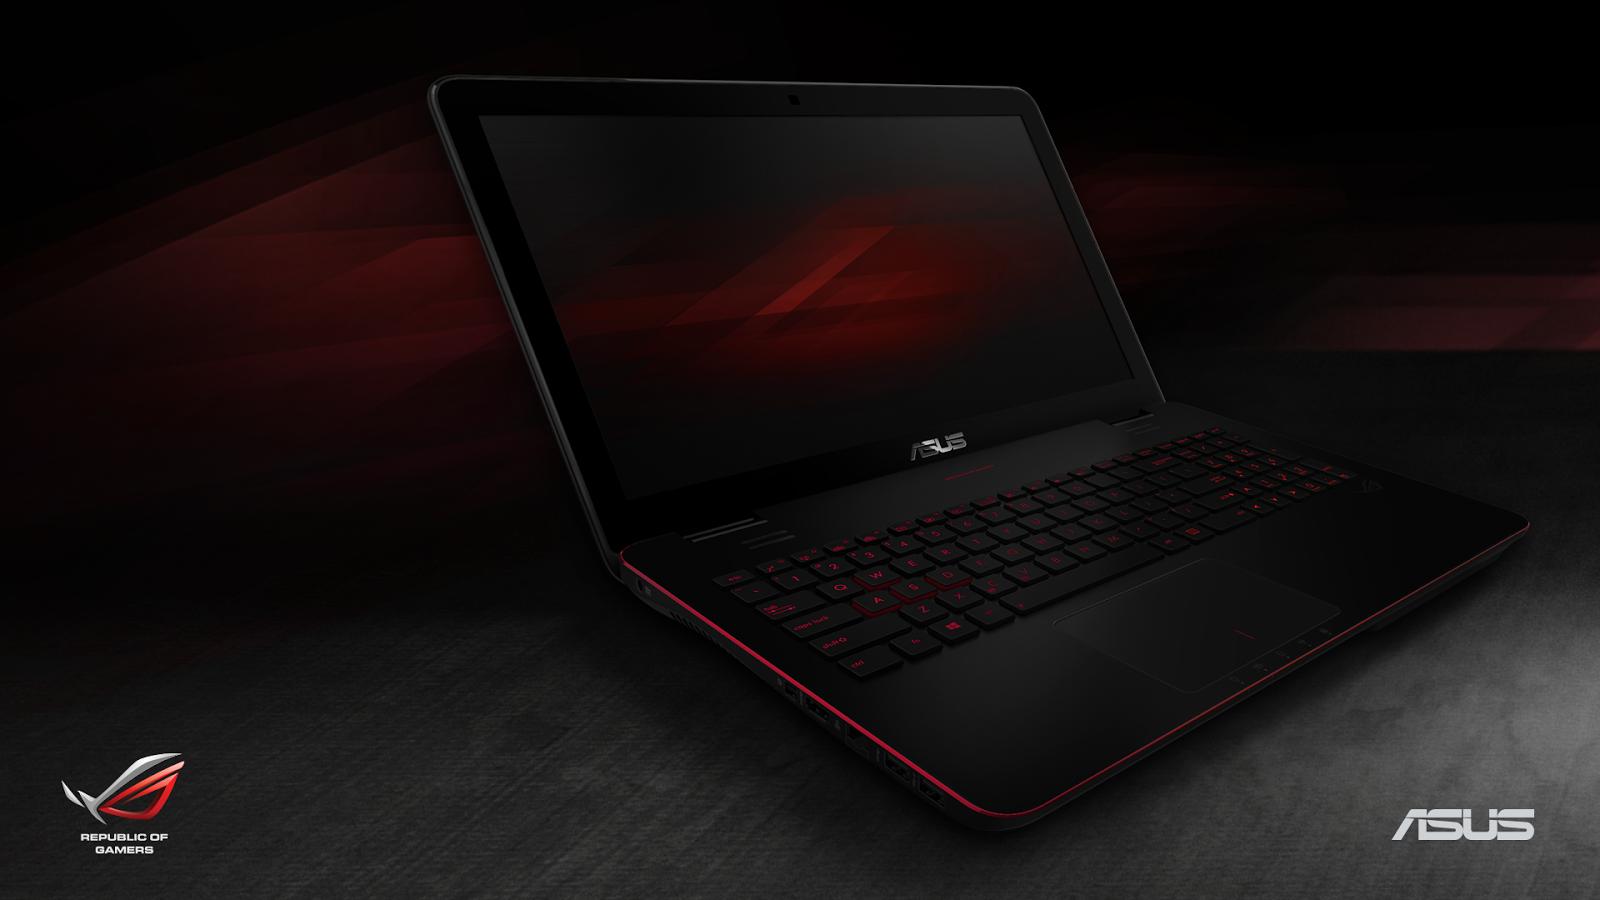 Thesabel Tuto: Asus ROG G551JW Laptop Full Review